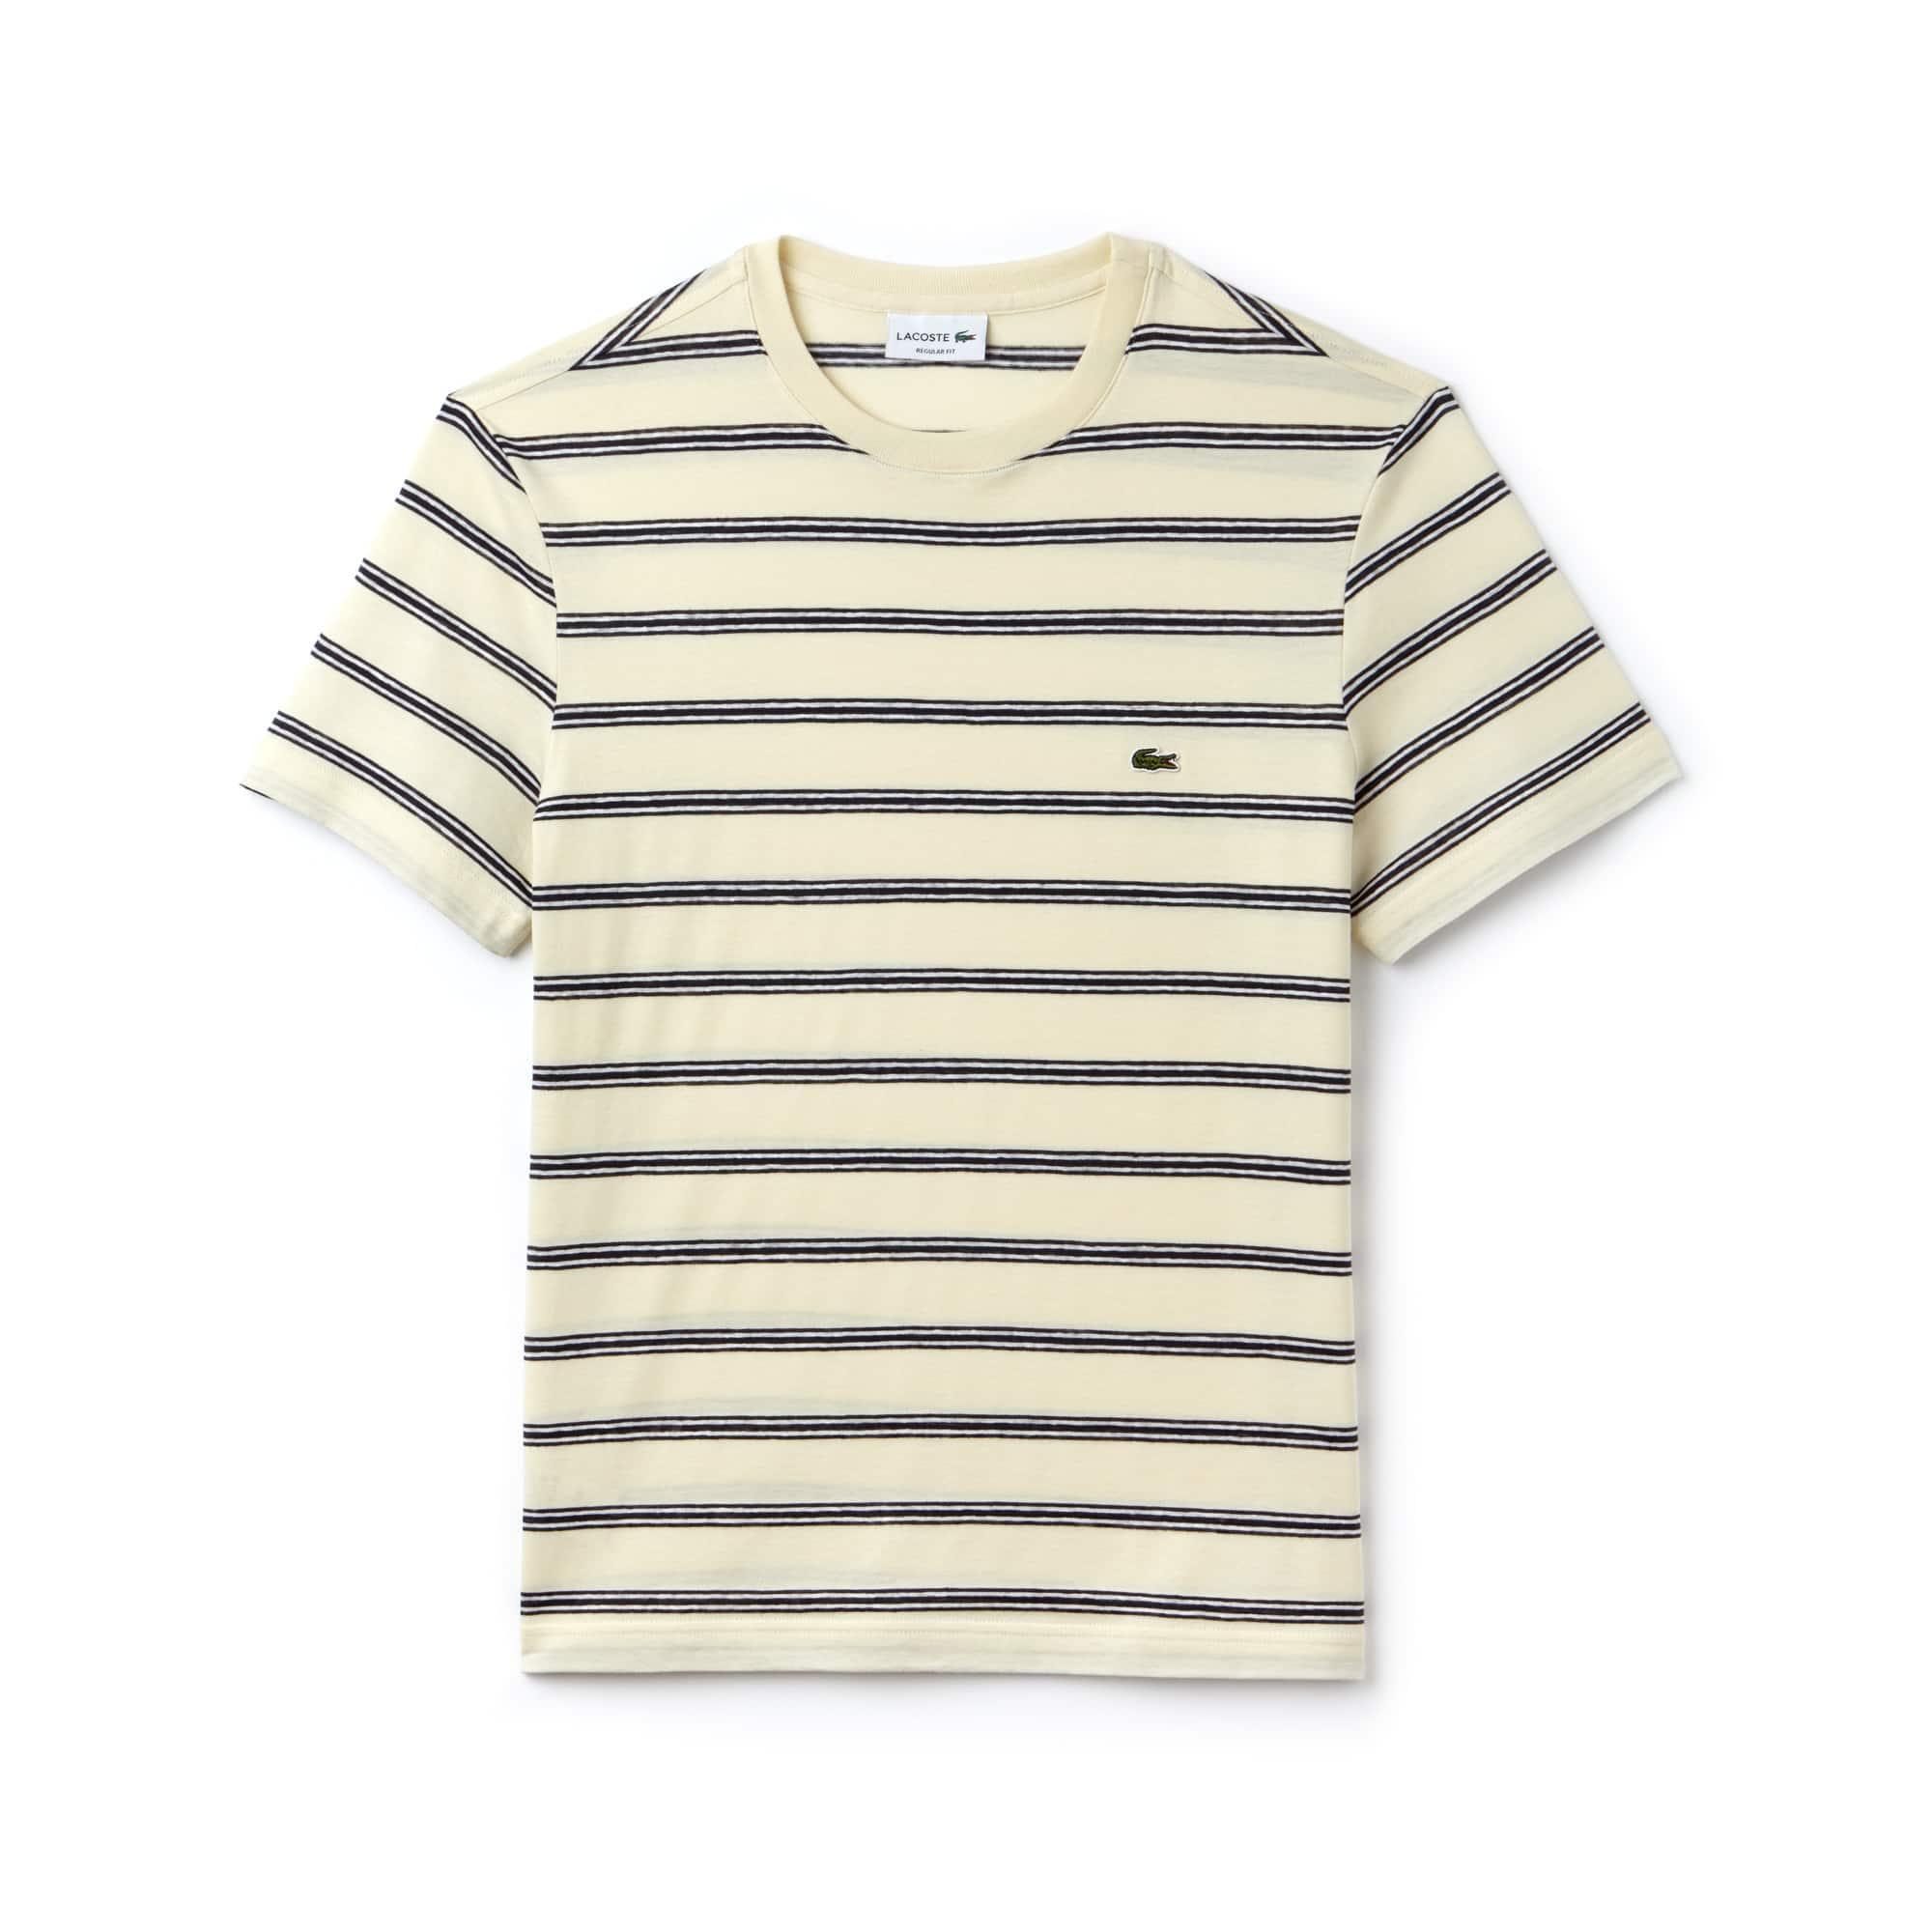 Men's Striped Cotton And Linen T-Shirt